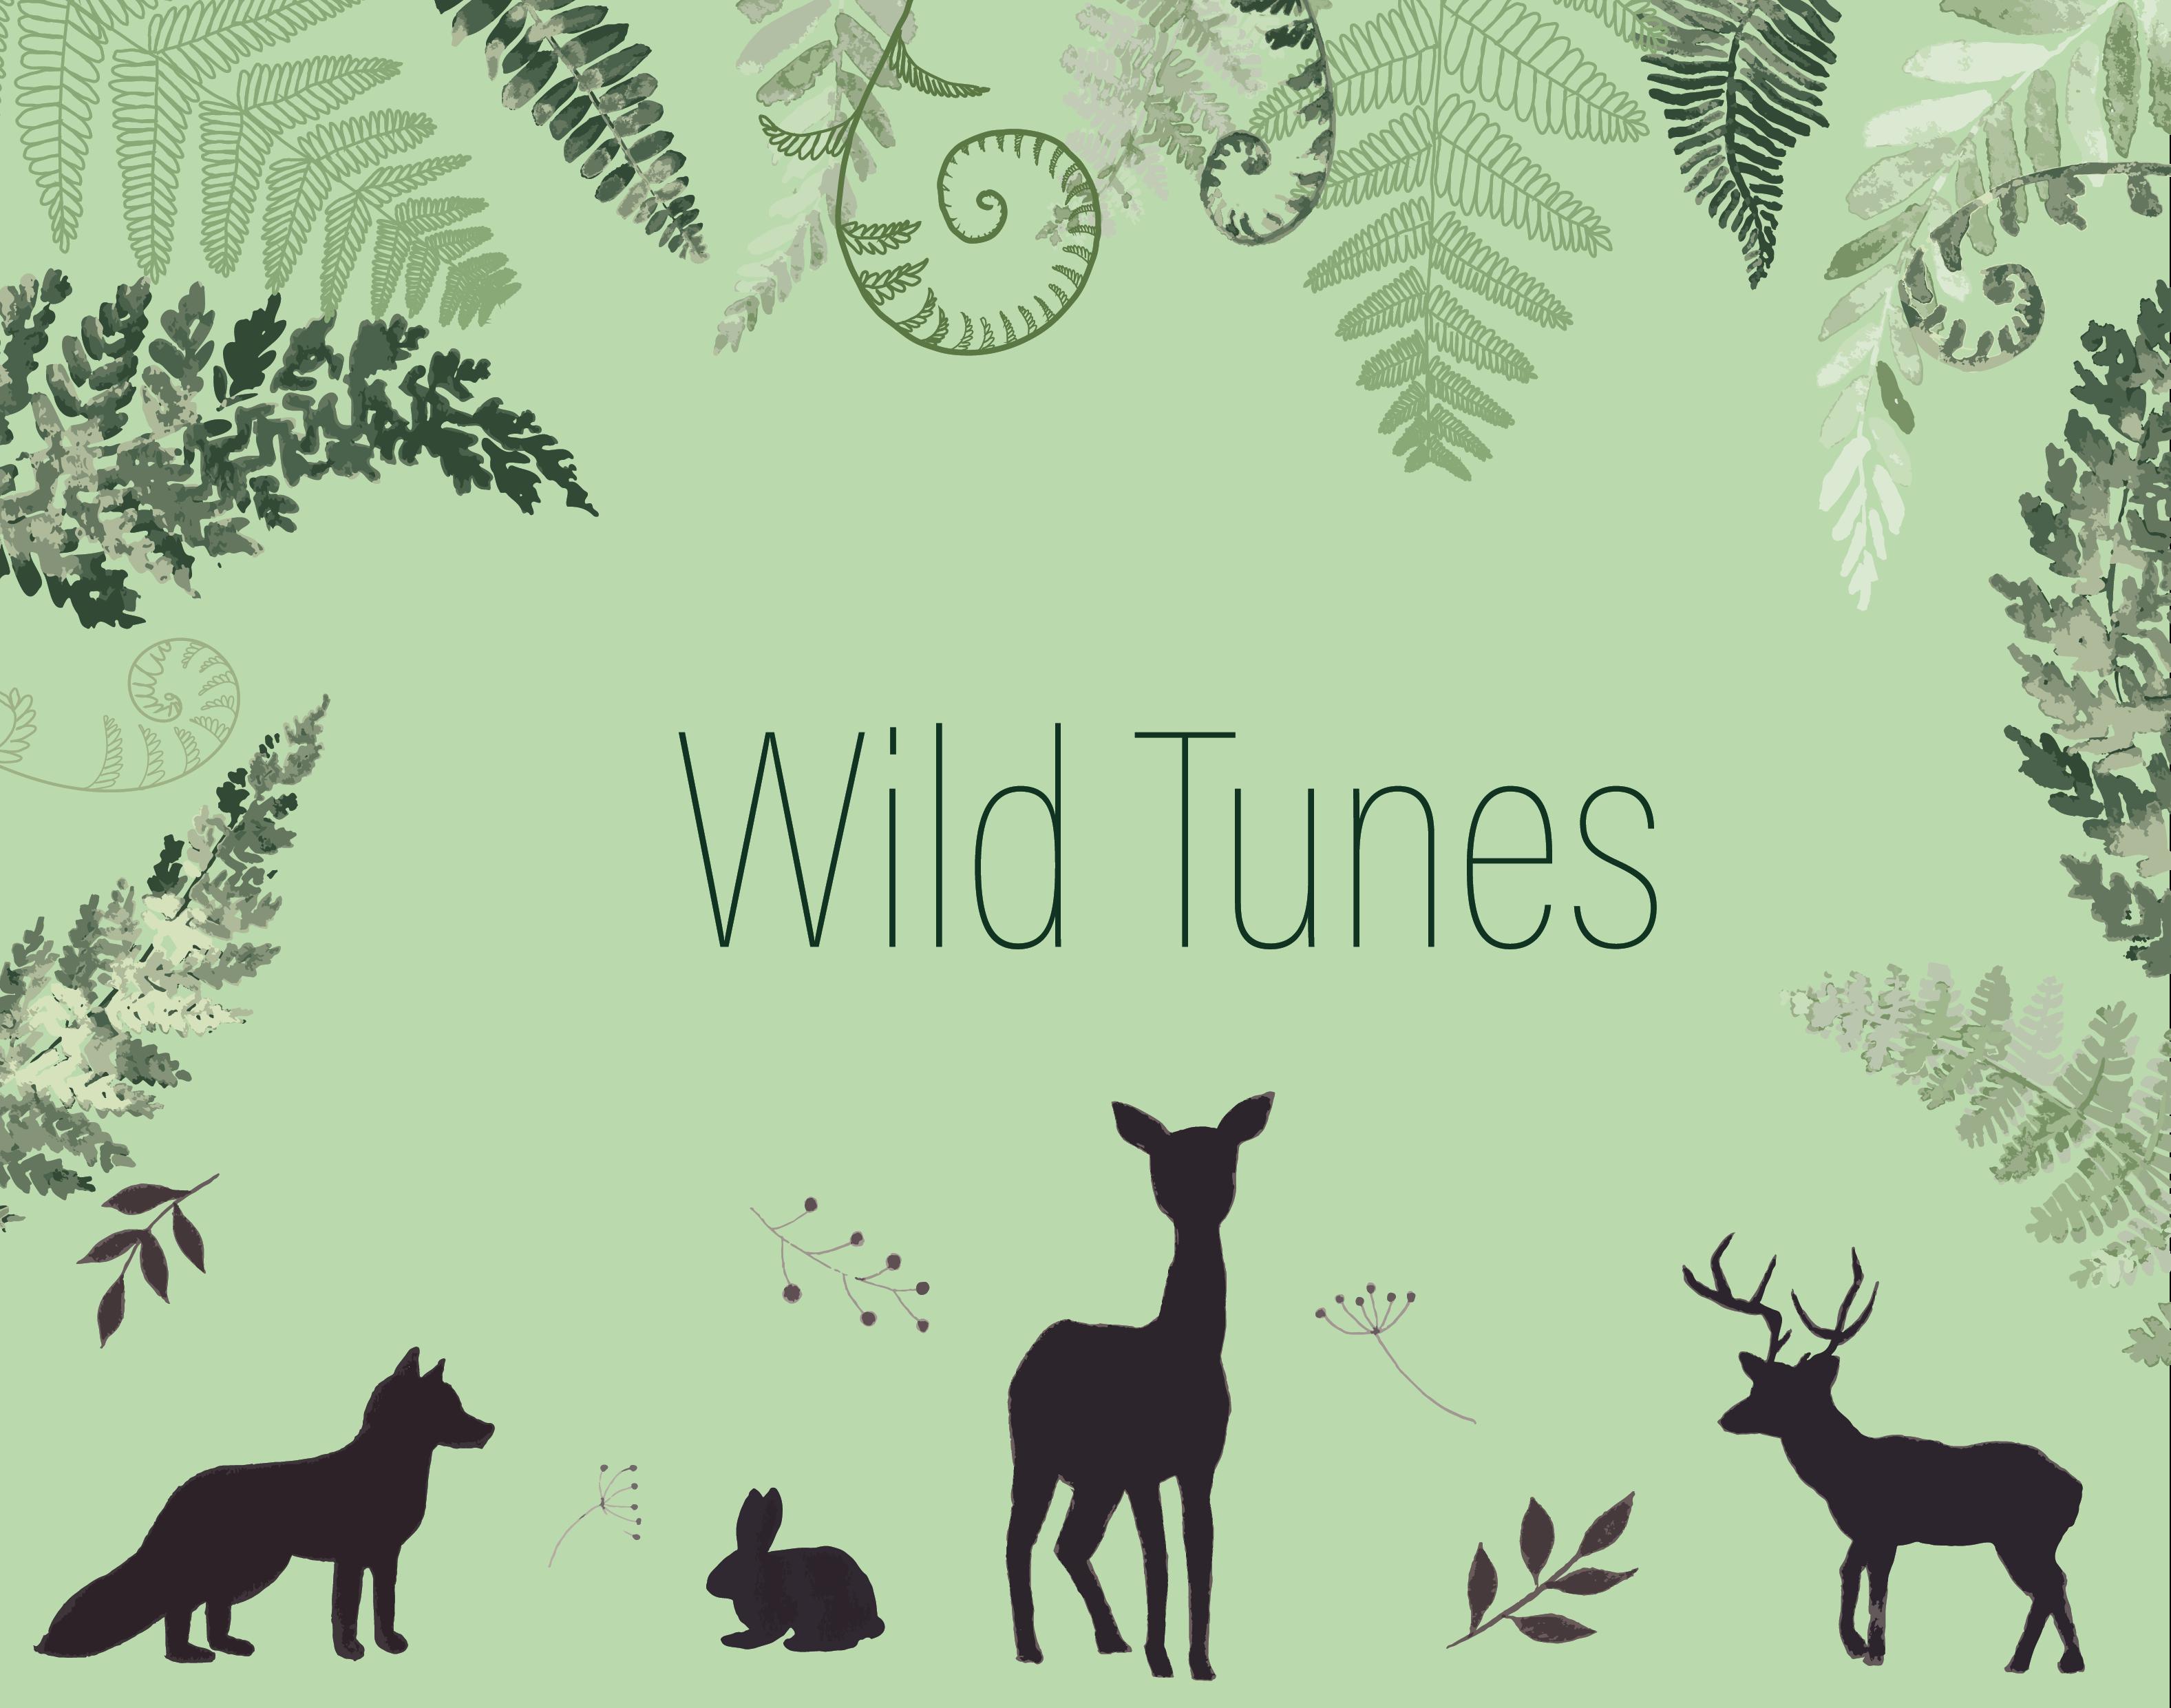 Wild Tunes